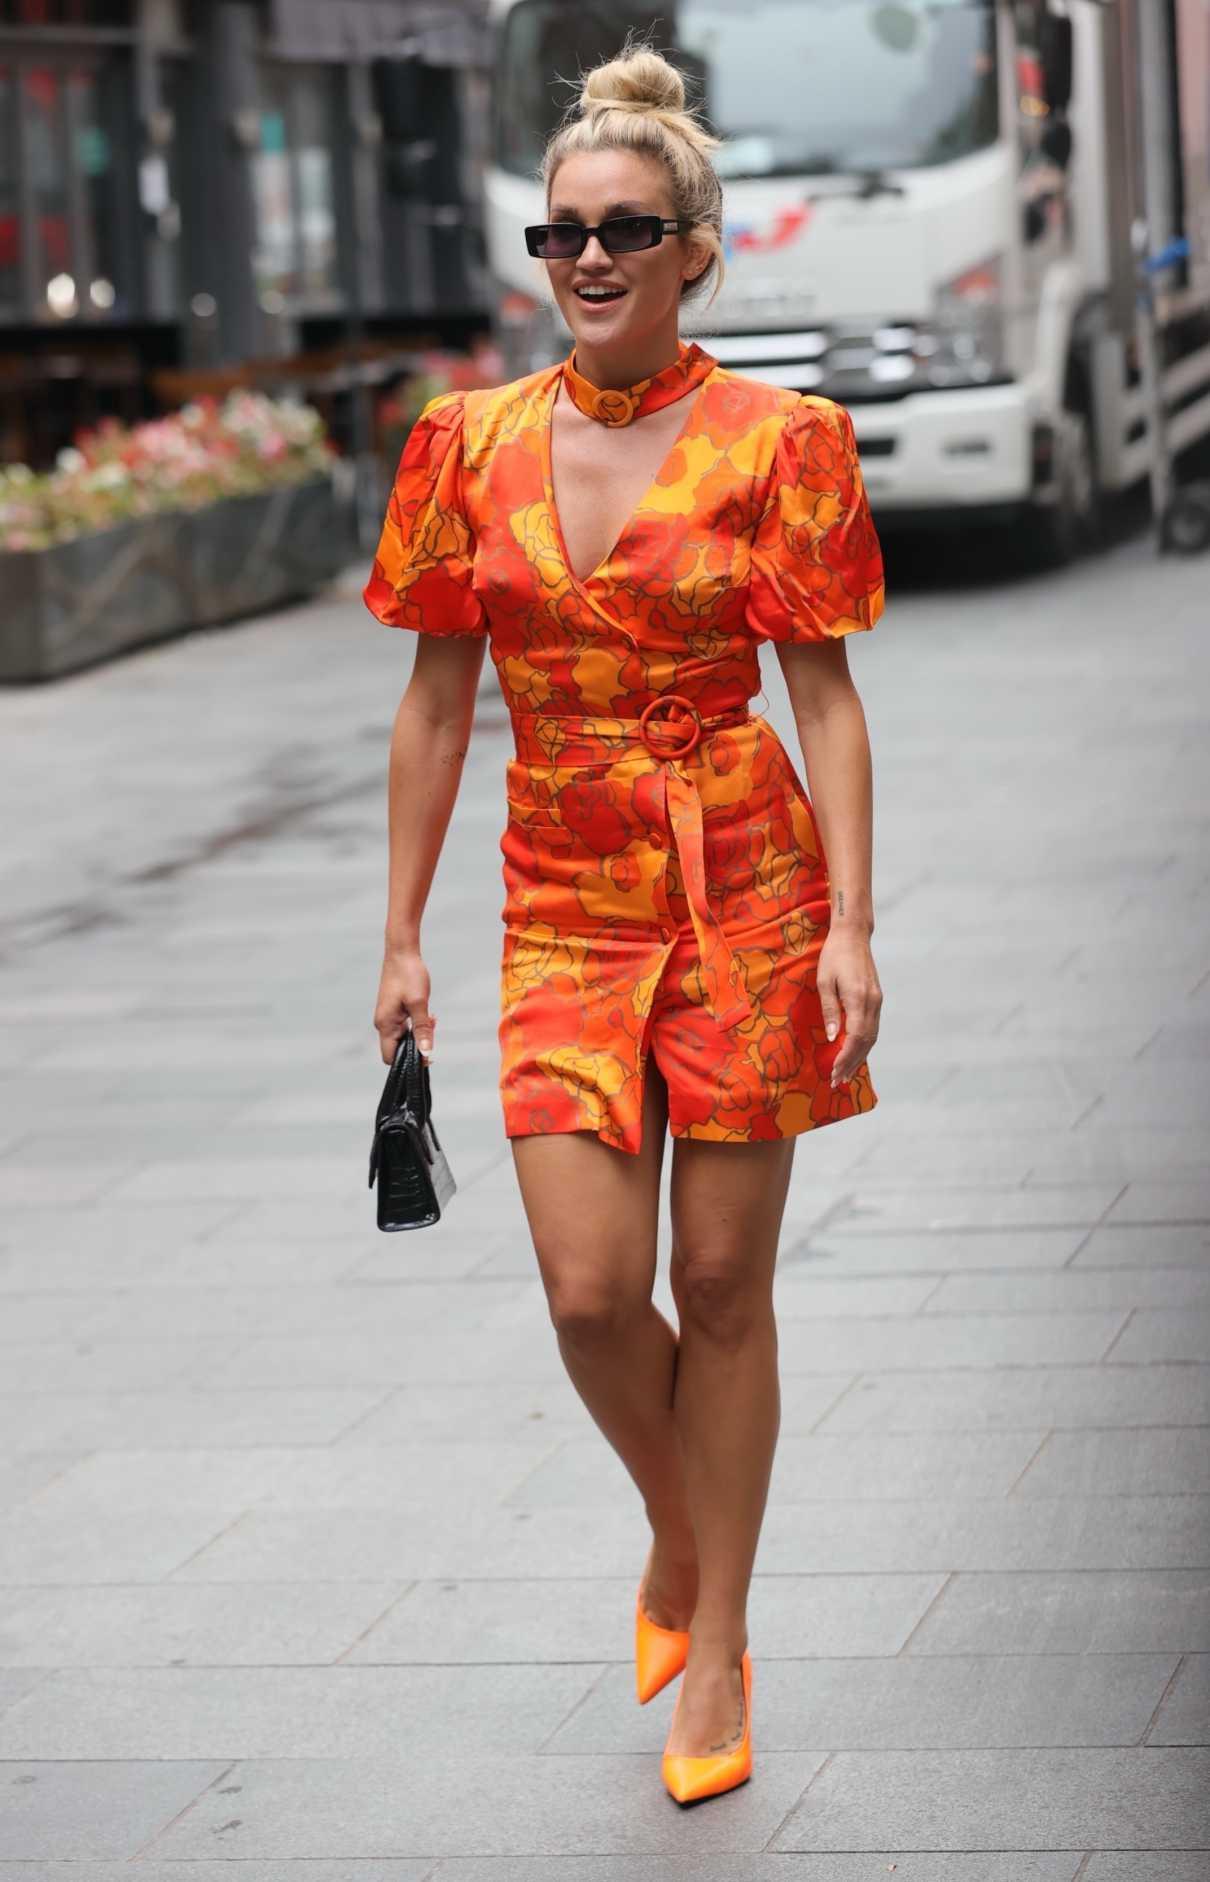 Ashley Roberts in an Orange Floral Dress